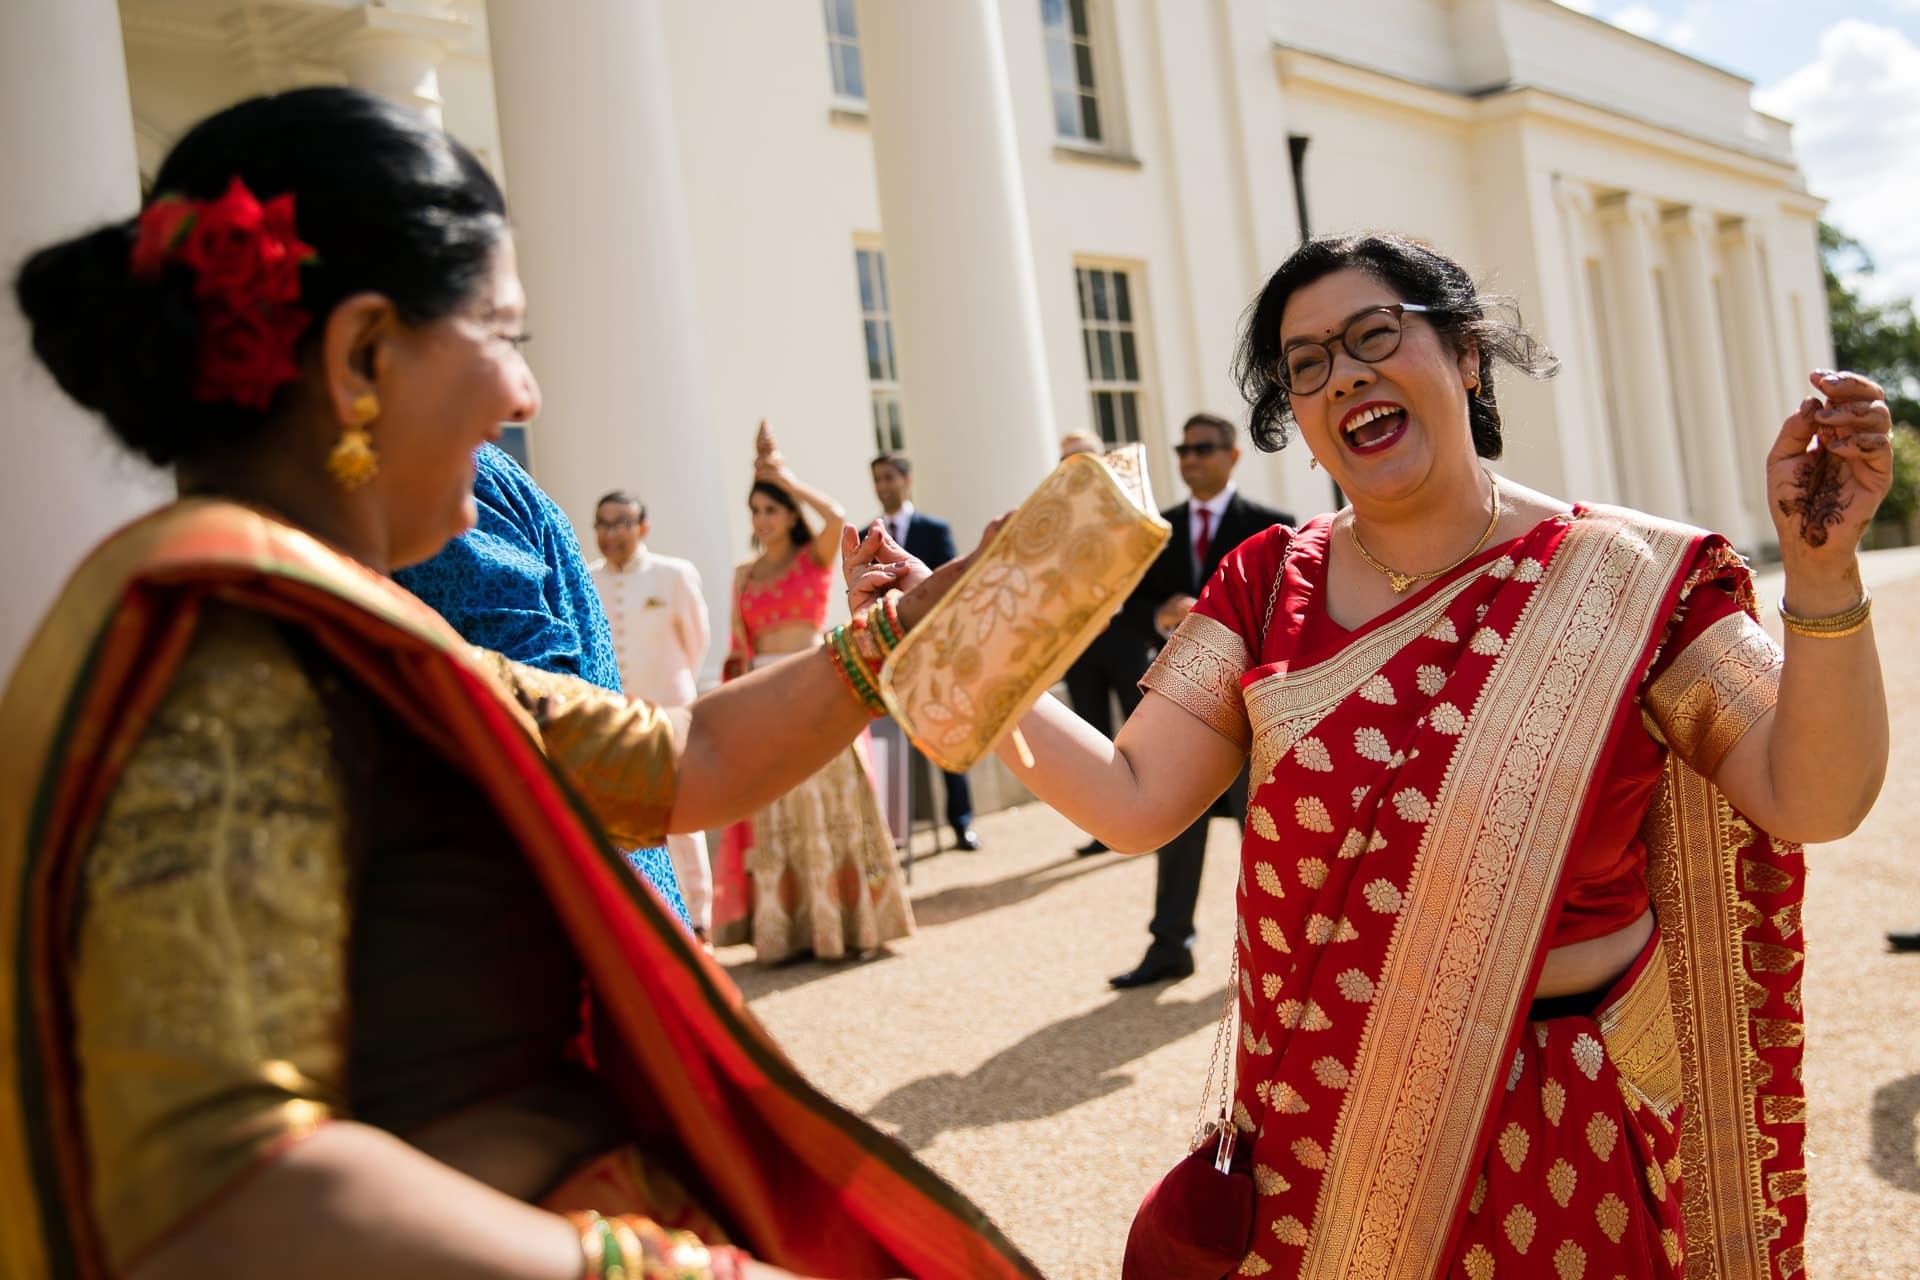 Mothers of bride and groom dancing